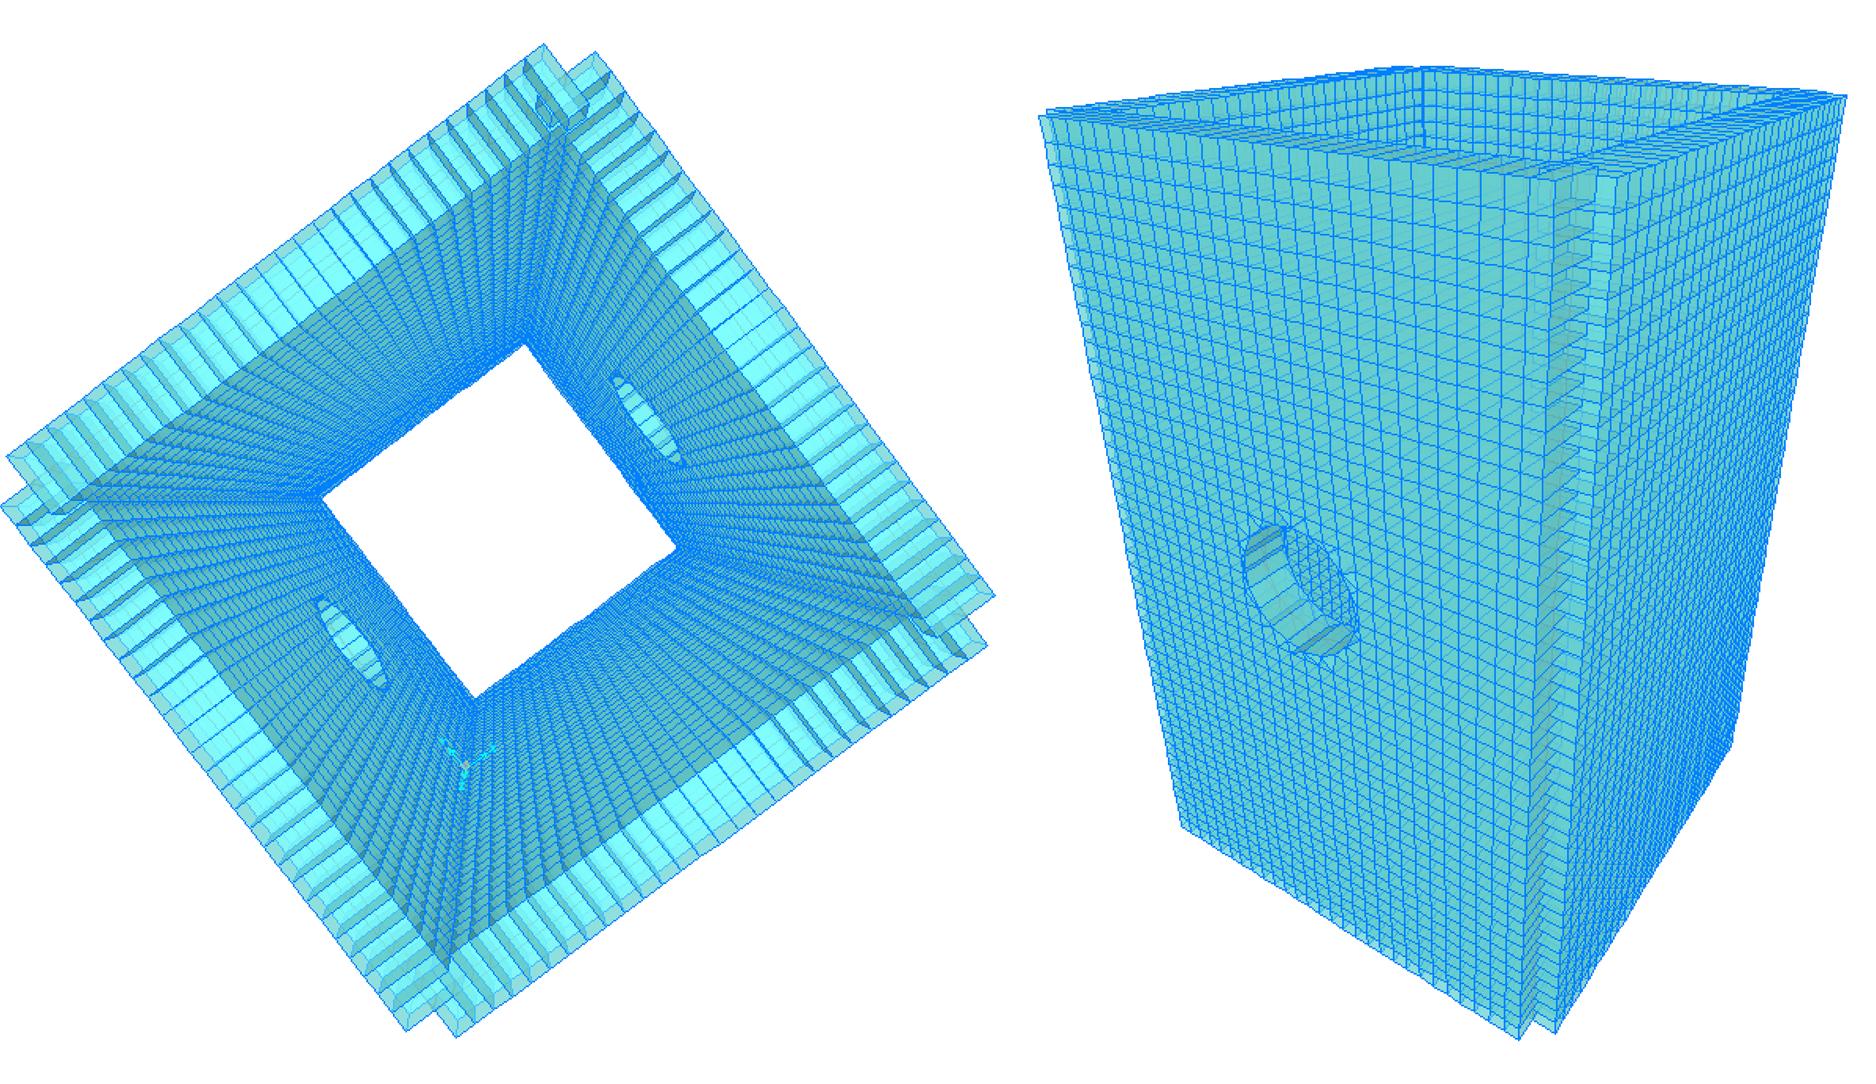 2. Tuberia Tibitoc  CCP, diseño pantallas preexcavas con orificos para paso de tuberia